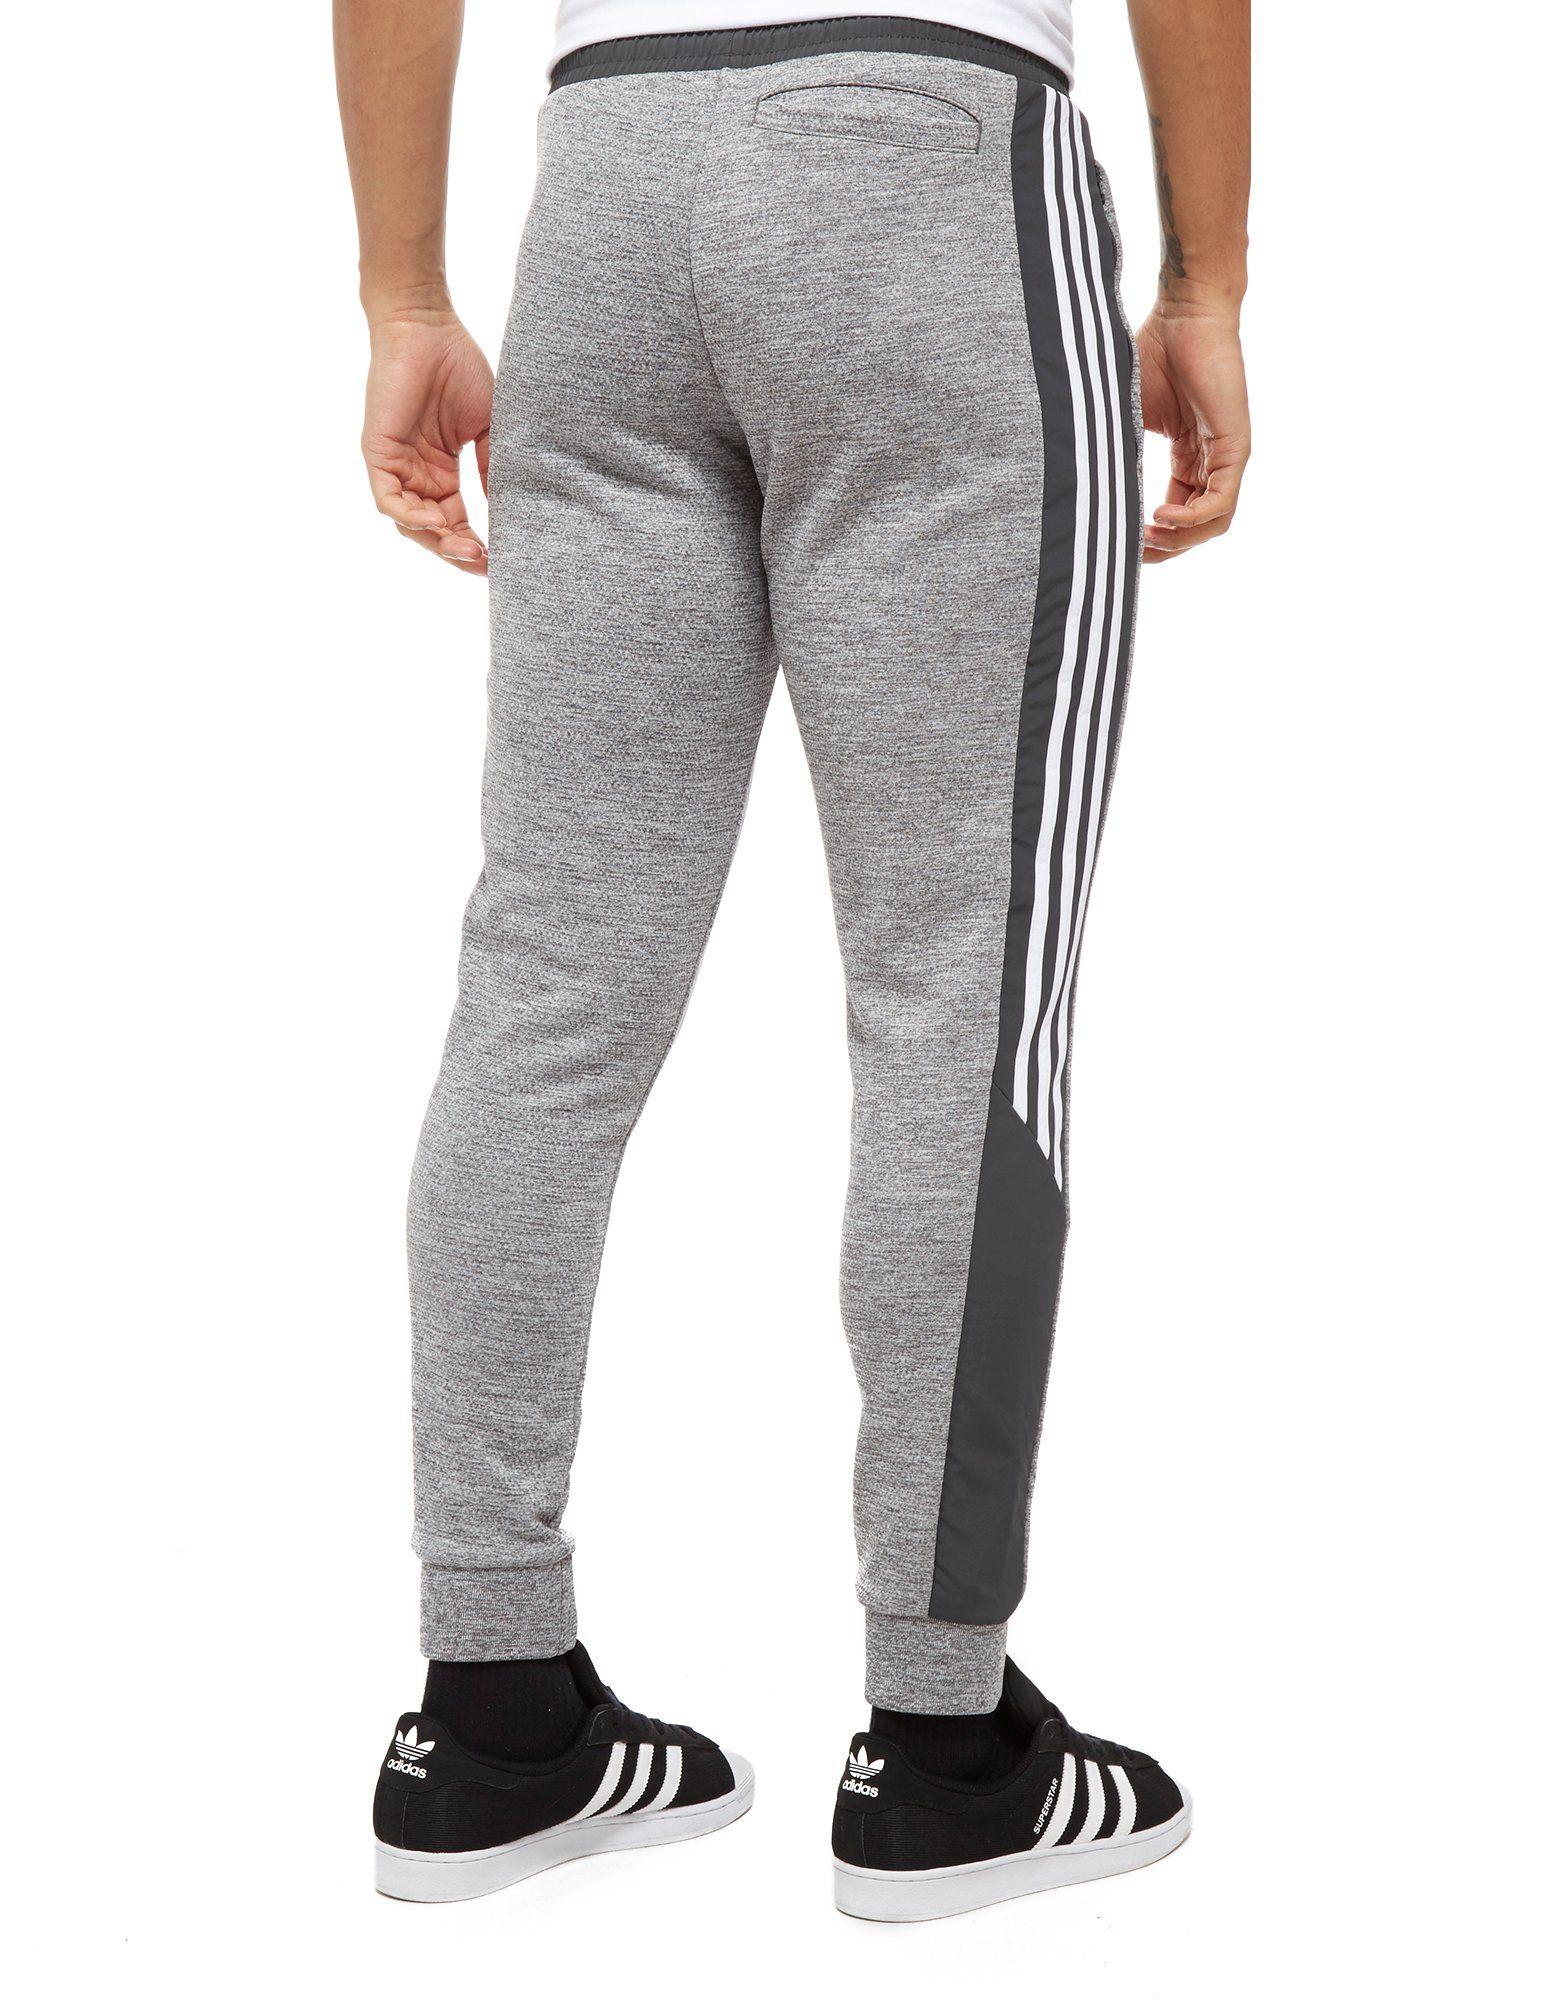 Nike Rfu - Pantalon De Sport Hommes, Couleur, Taille 42,5 Eu